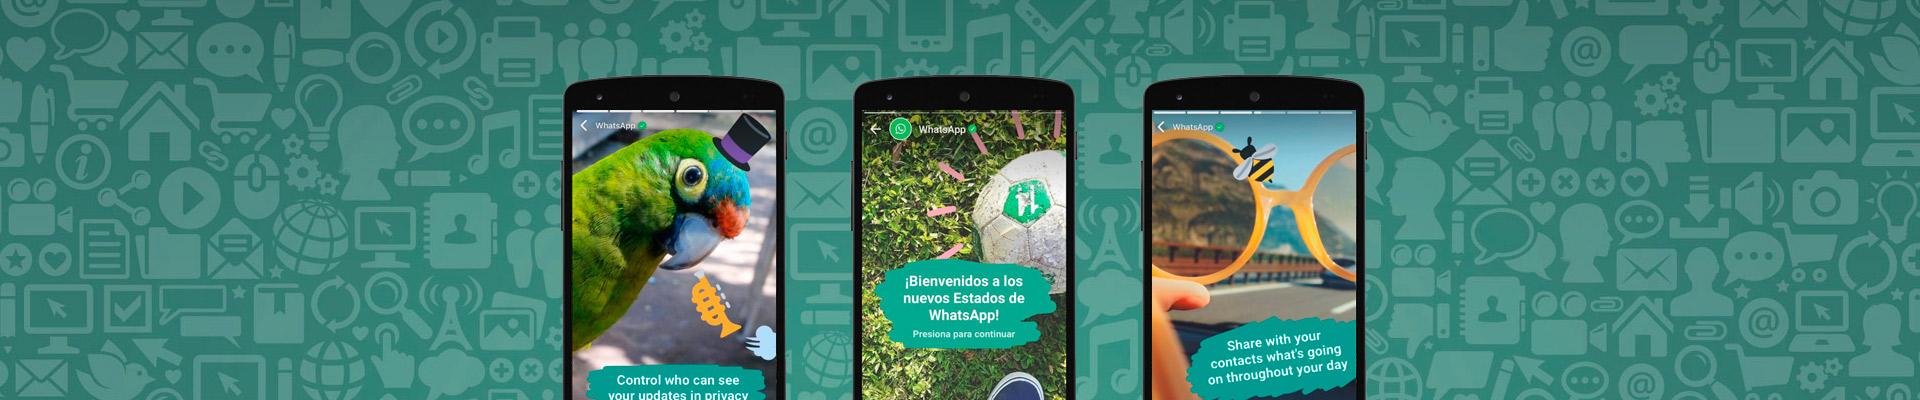 Se Confirmó El Rumor: Llega WhatsApp Status